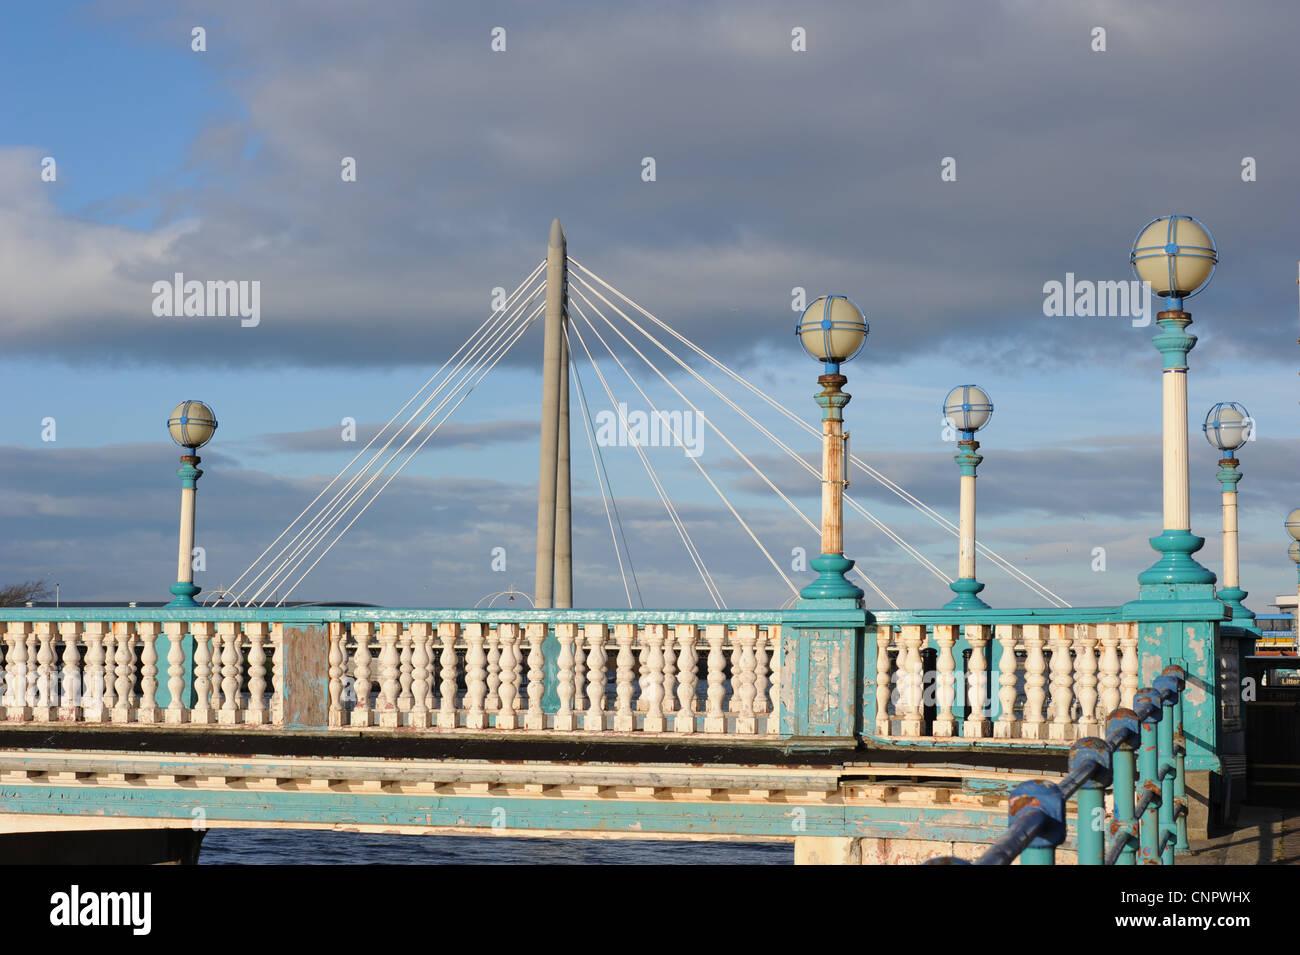 Old Scarisbrick Avenue Bridge over Marine Lake, Southport. Merseyside, with modern Marine Way cable stayed bridge - Stock Image